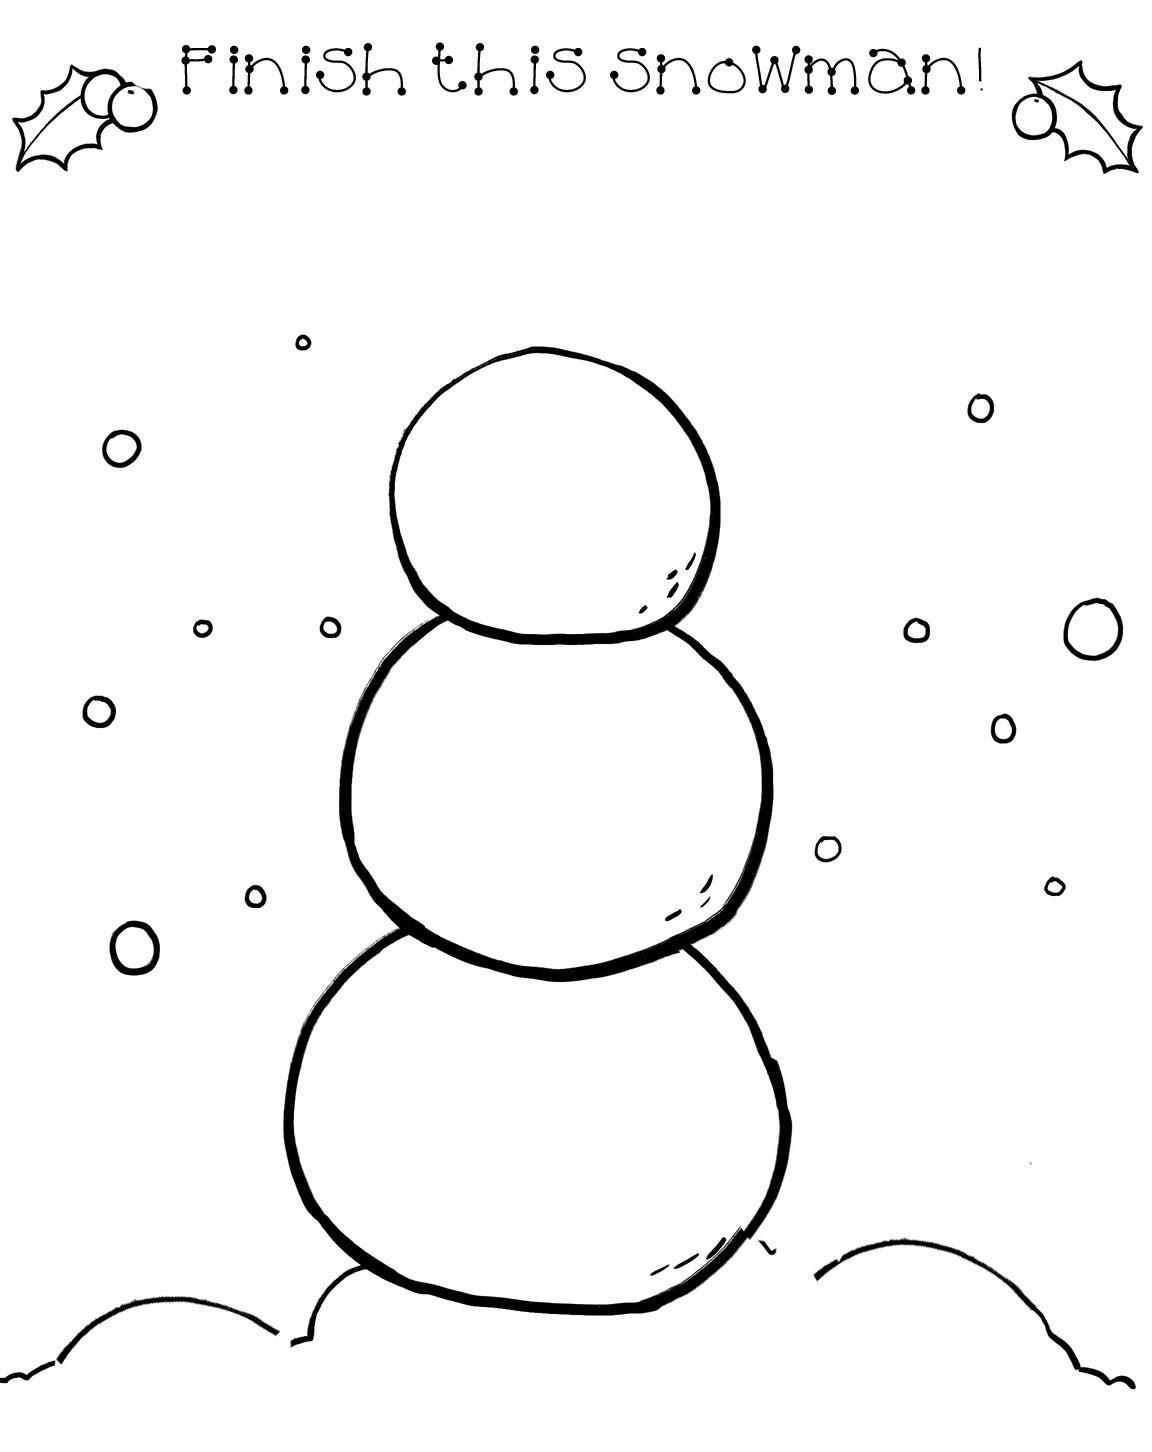 baby potatoes draw a snowman